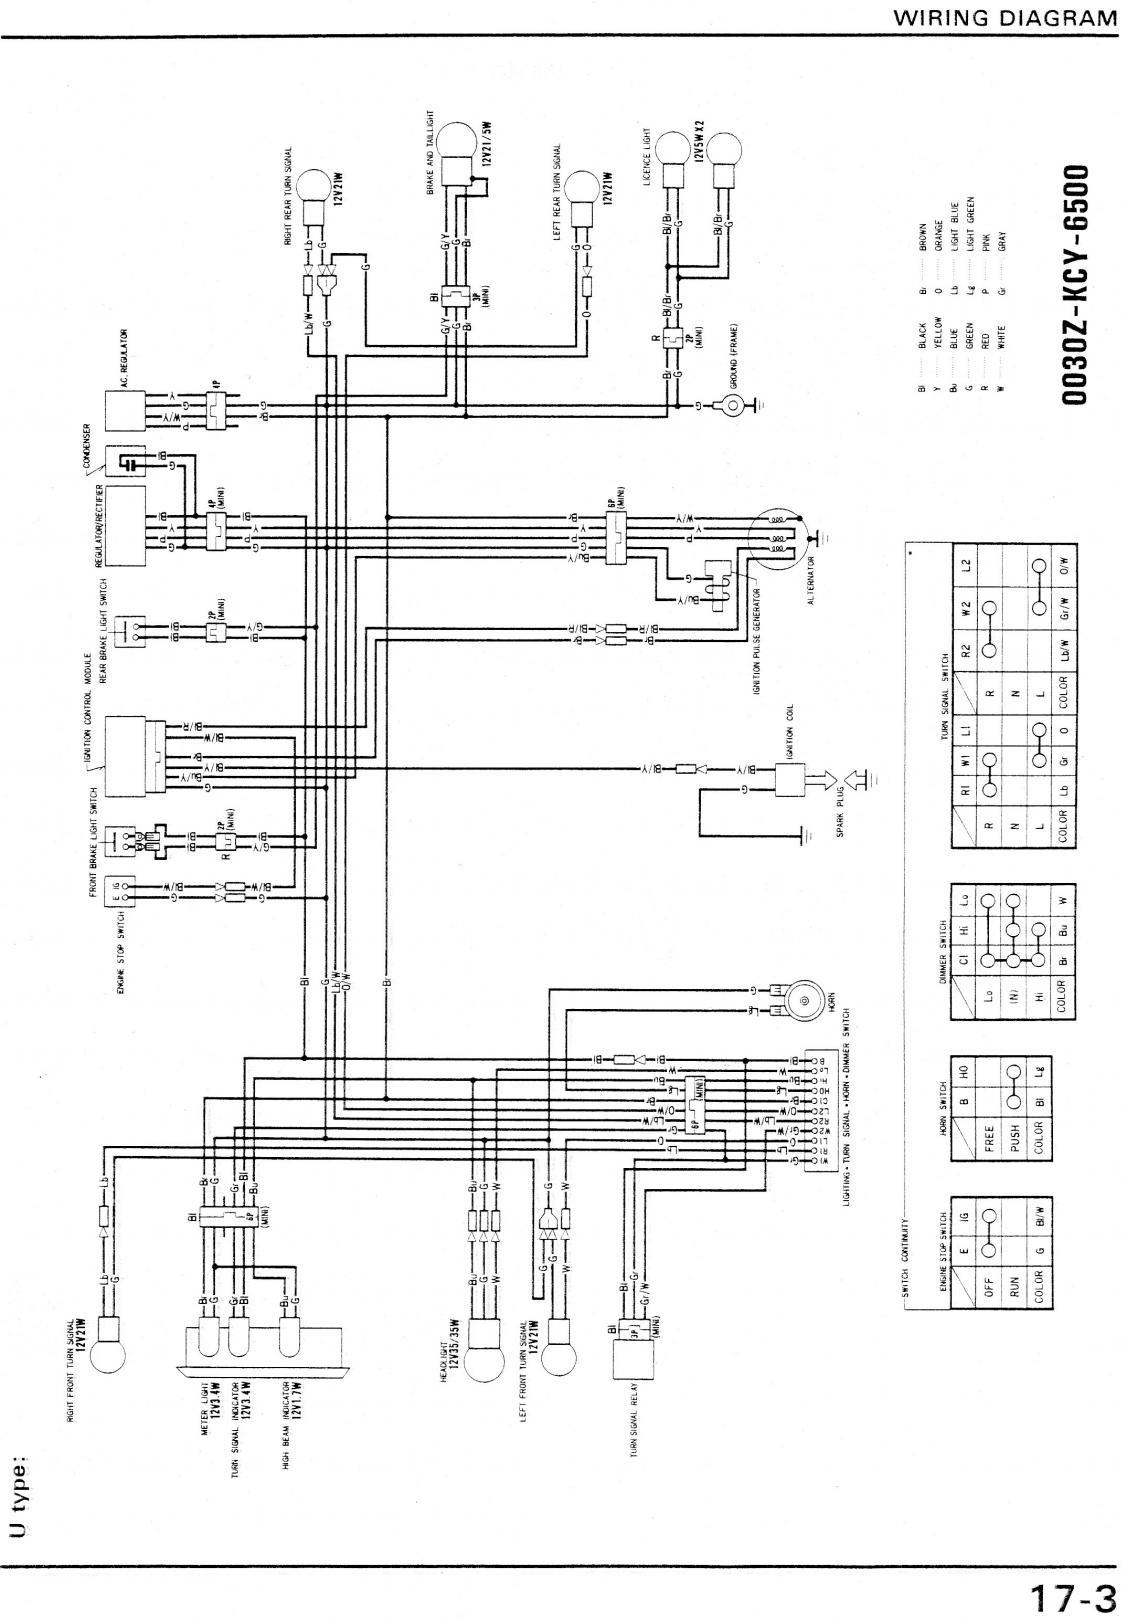 hight resolution of air handler wiring diagrams in addition heil air handler wiring